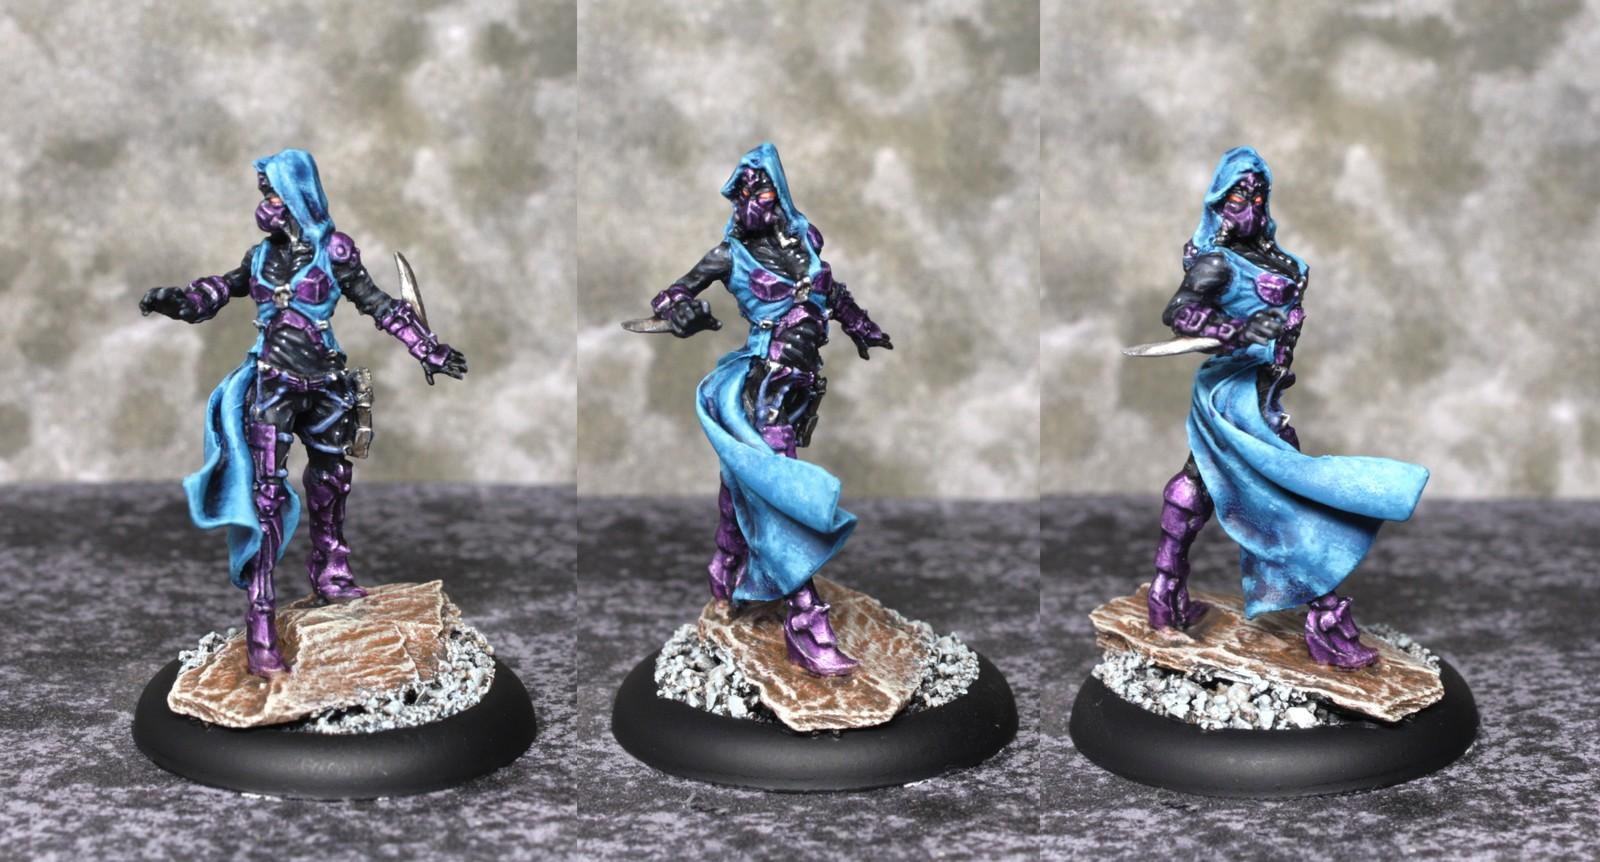 Assassin, Female, Graphigaut, Killer, Nikita, Purple, Shadow, Turquoise, Warforge